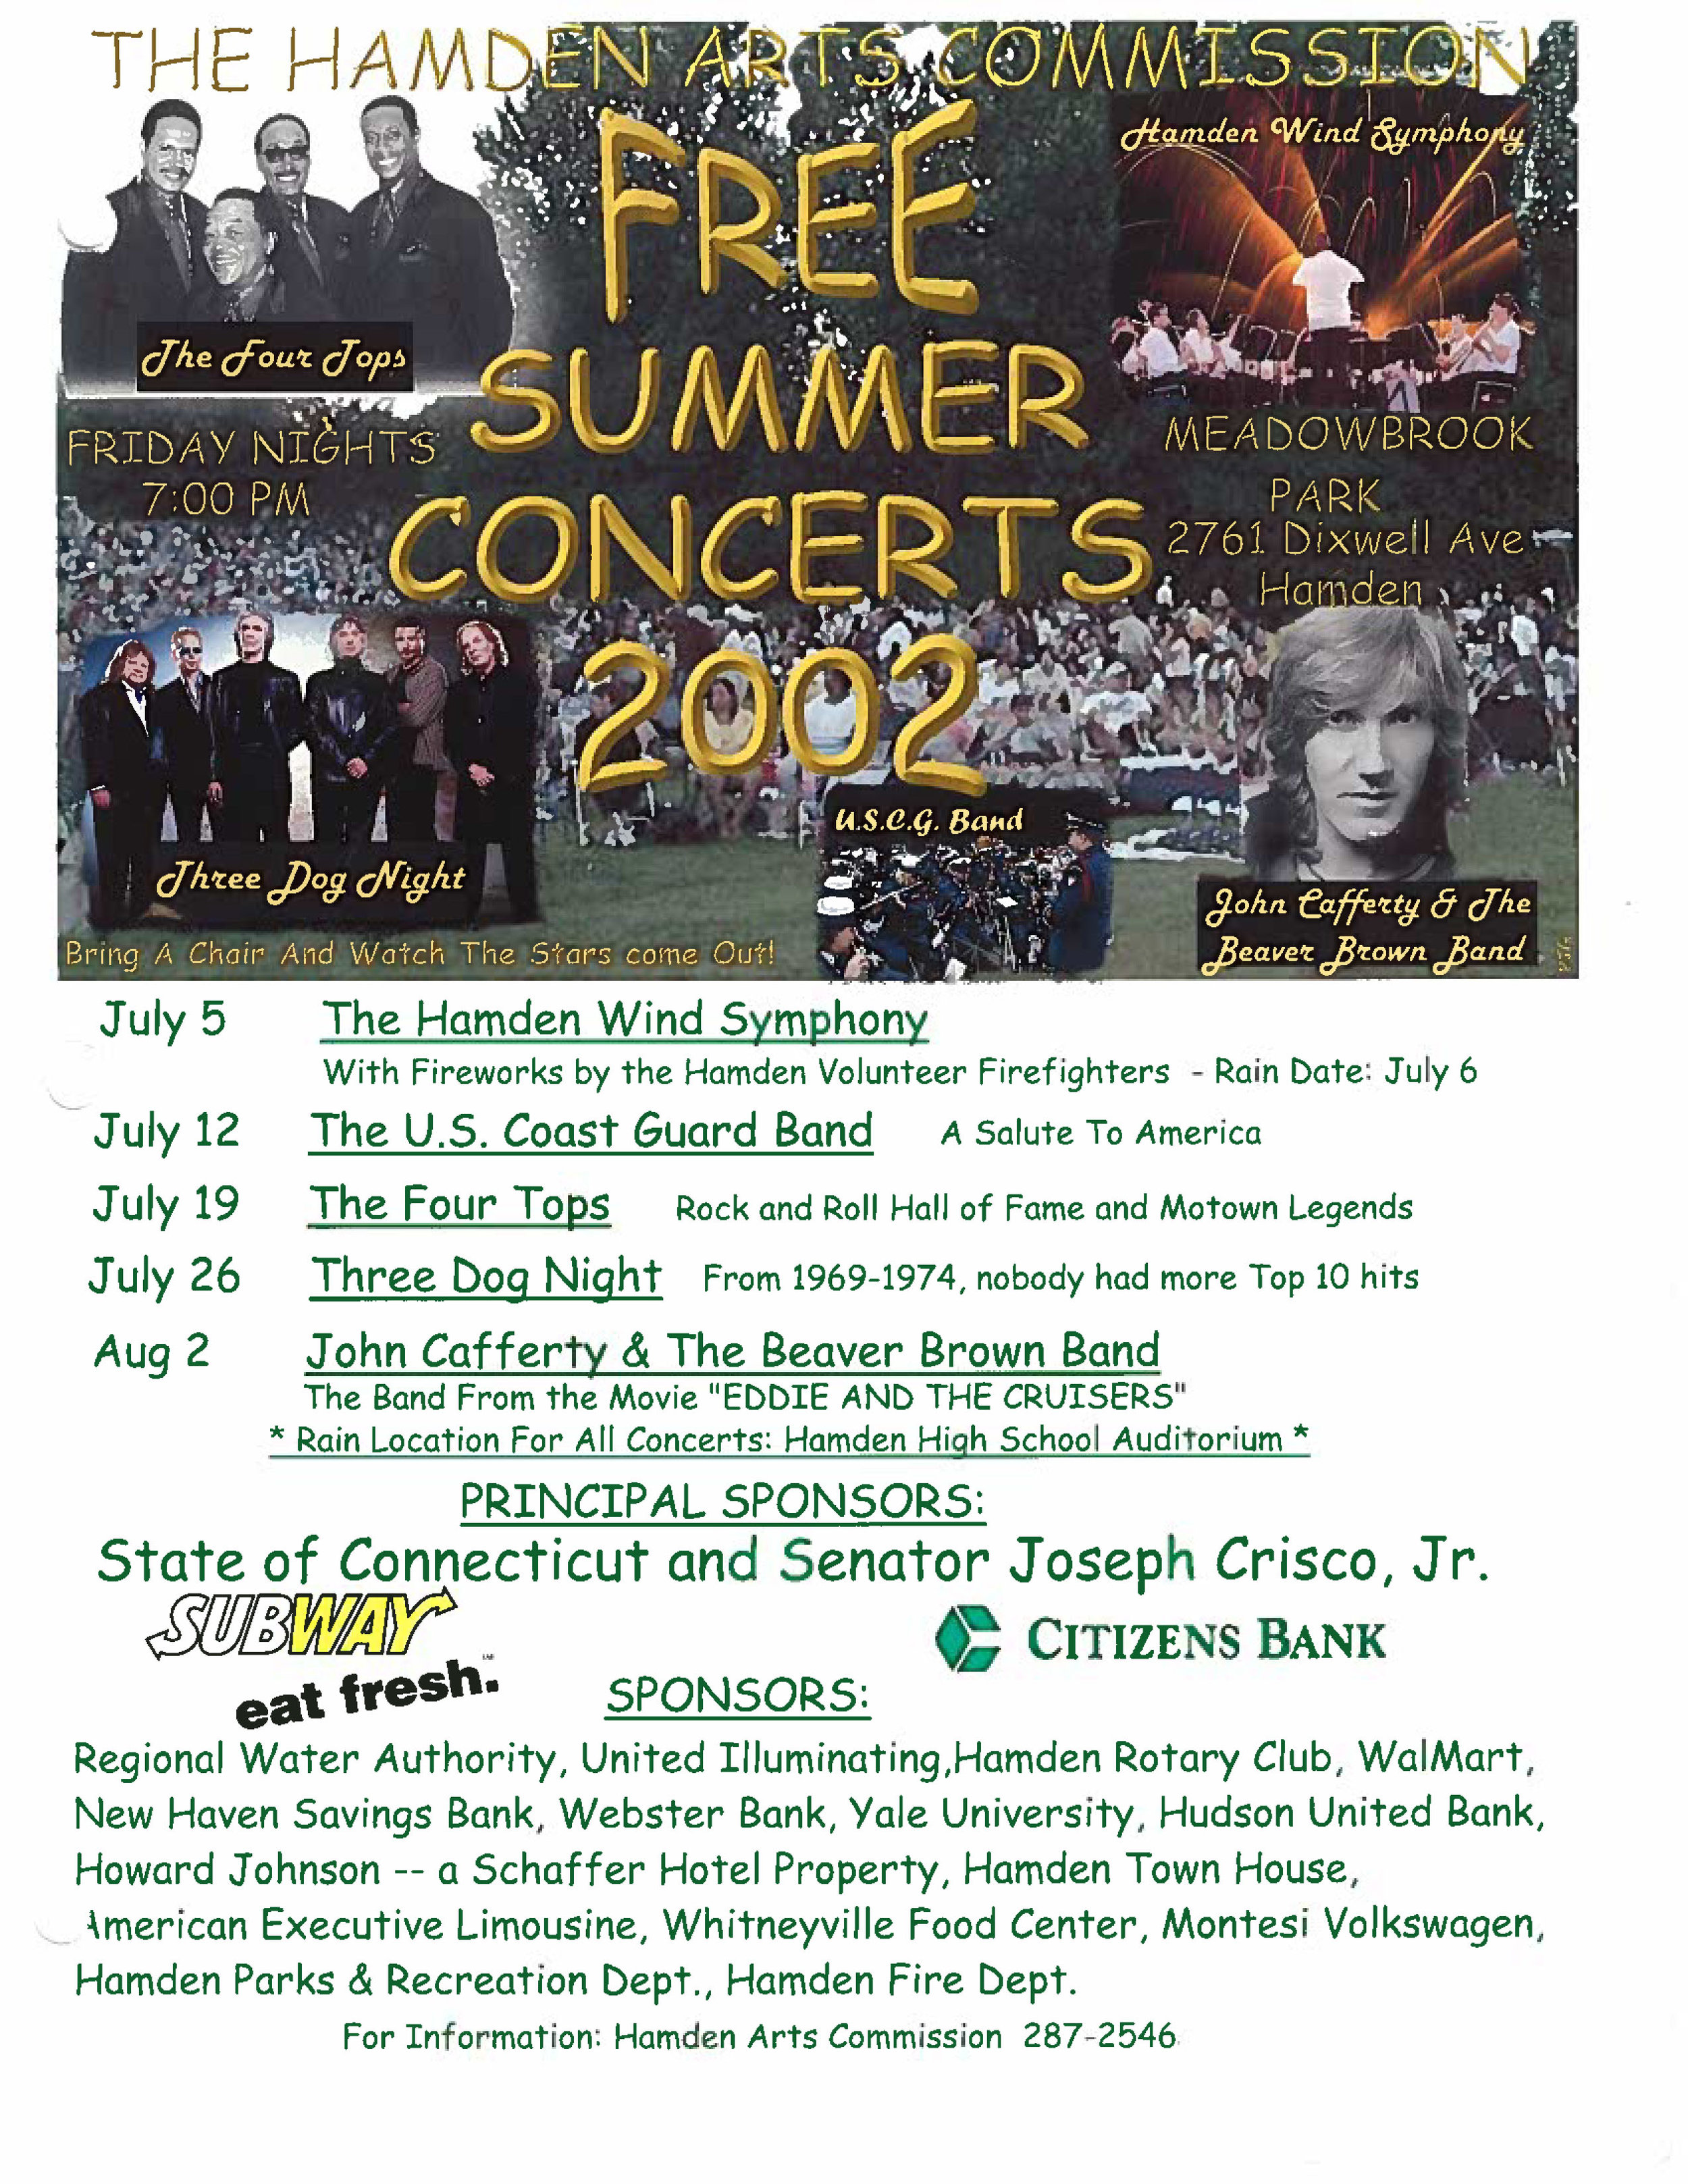 2002_Concerts Program.jpg